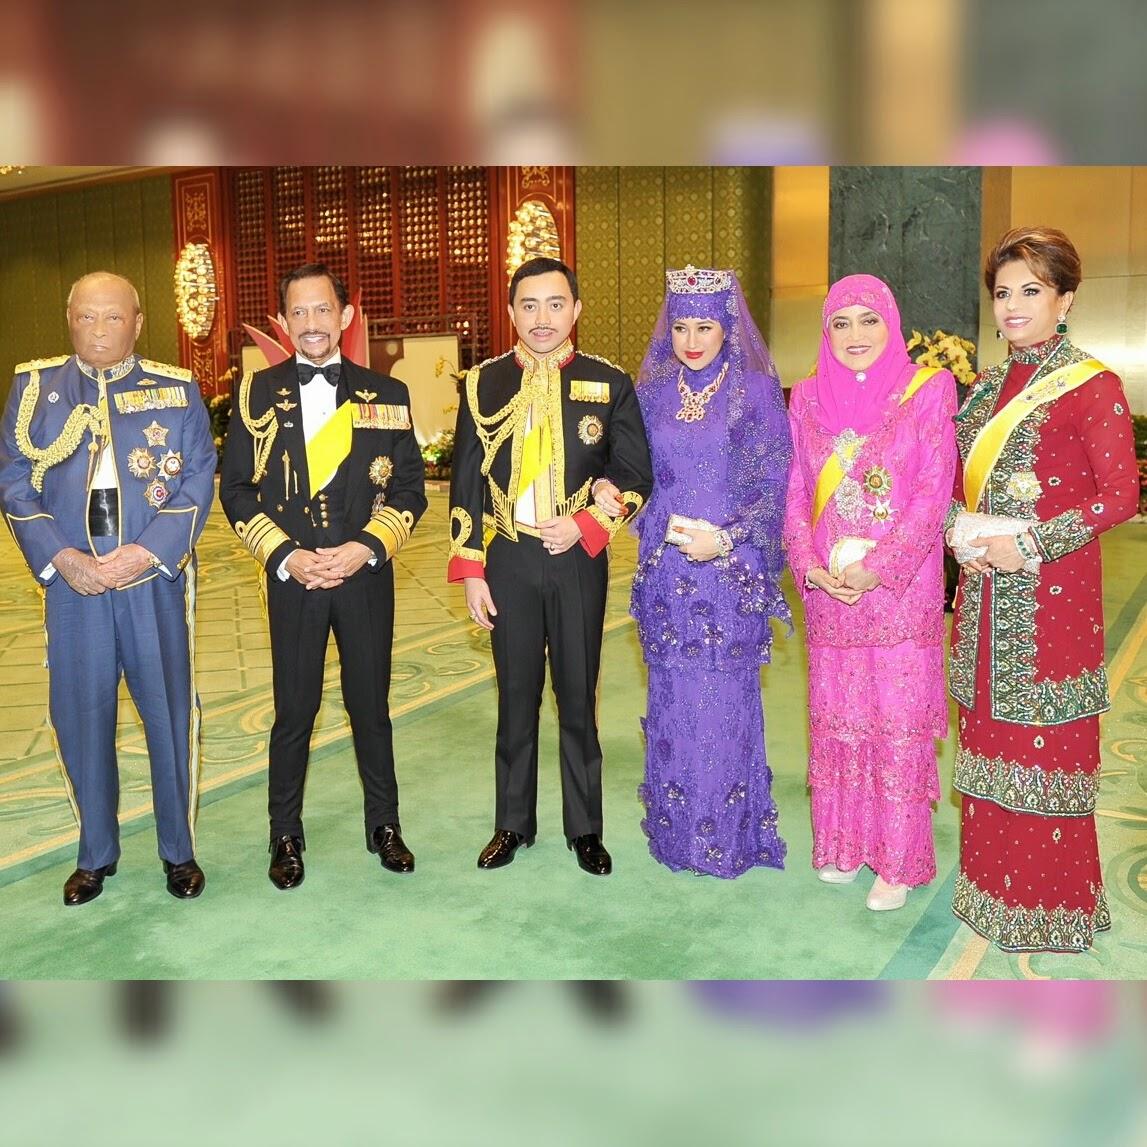 kee hua chee live his royal highness sultan ahmad shah